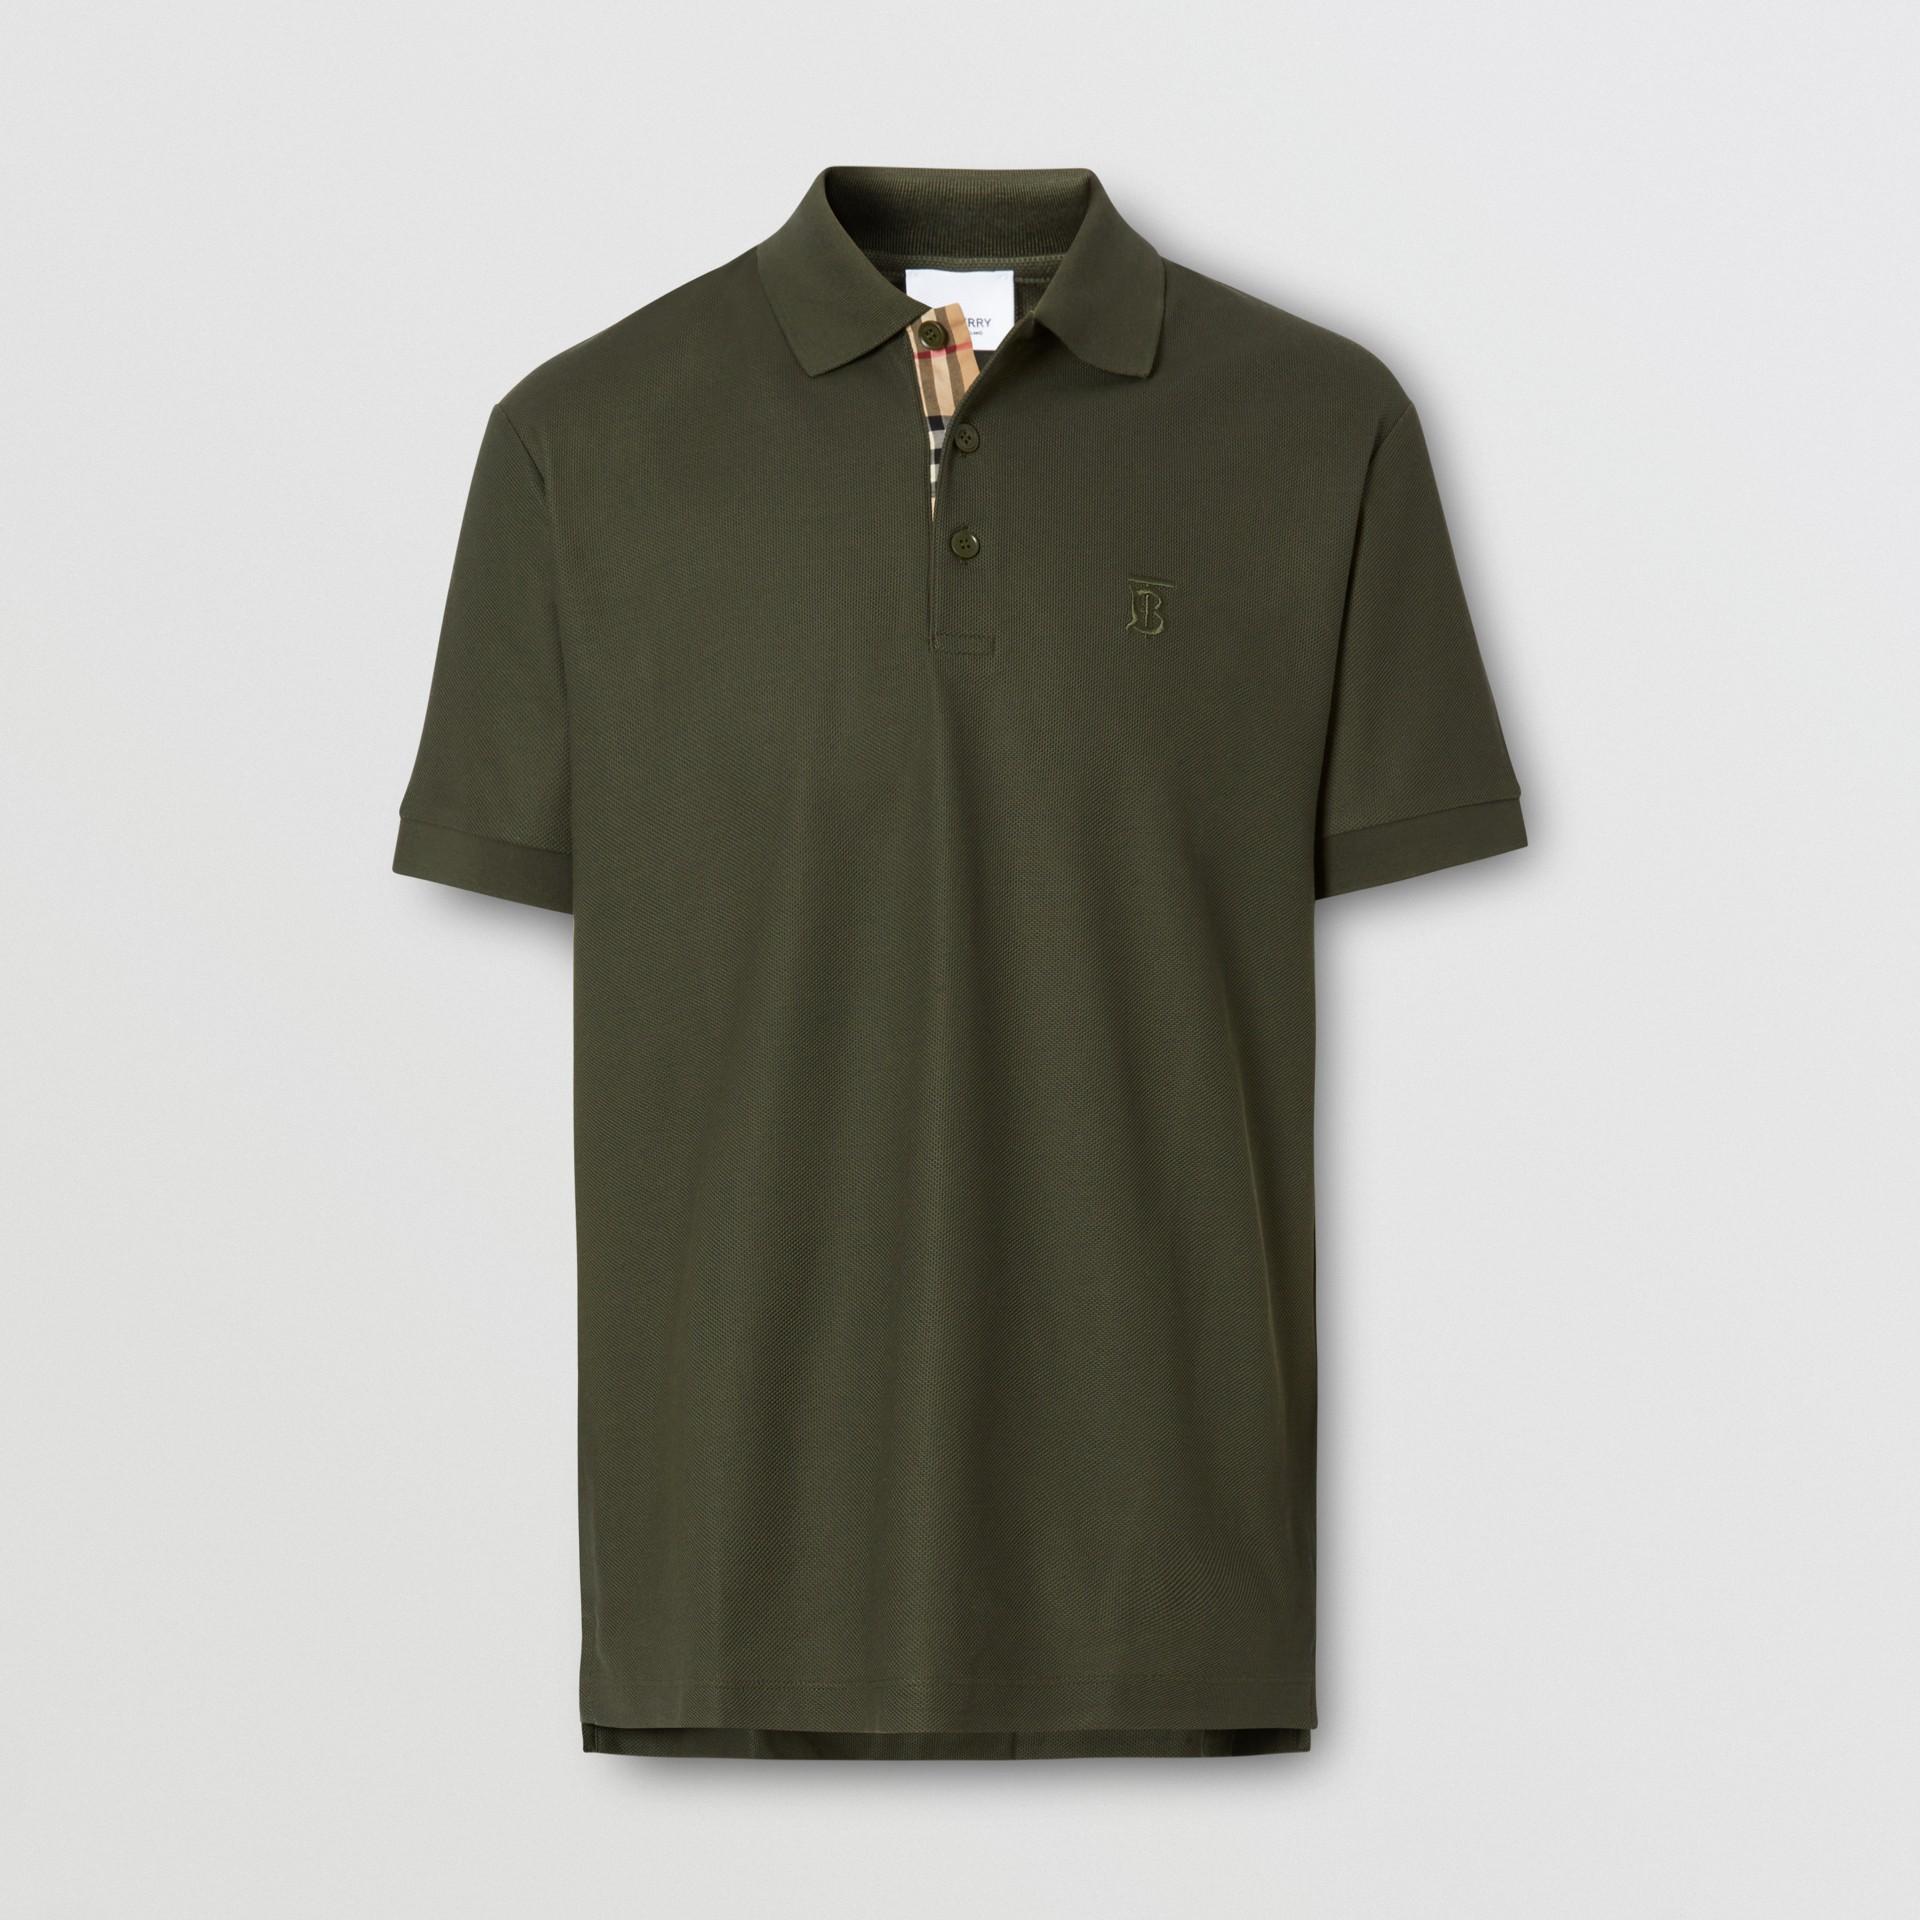 Monogram Motif Cotton Piqué Polo Shirt in Seaweed - Men | Burberry - gallery image 3